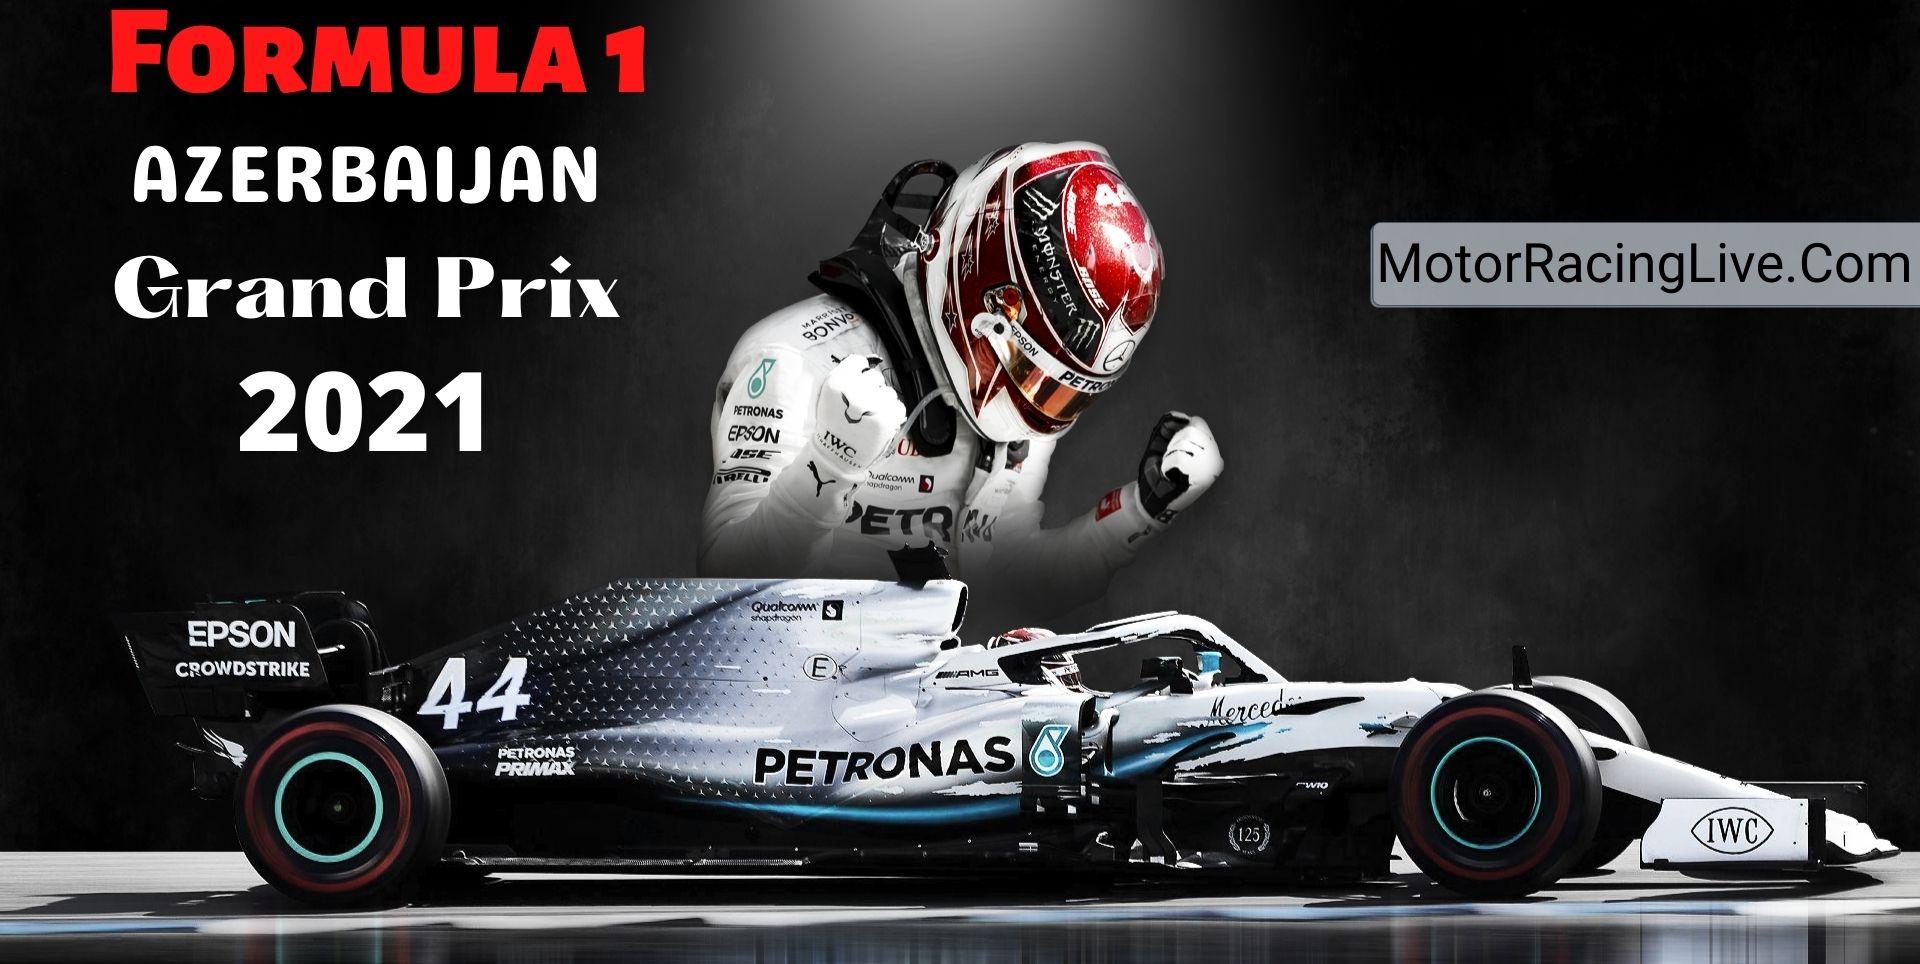 Azerbaijan F1 Grand Prix Live Streaming 2021 | Full Race Replay